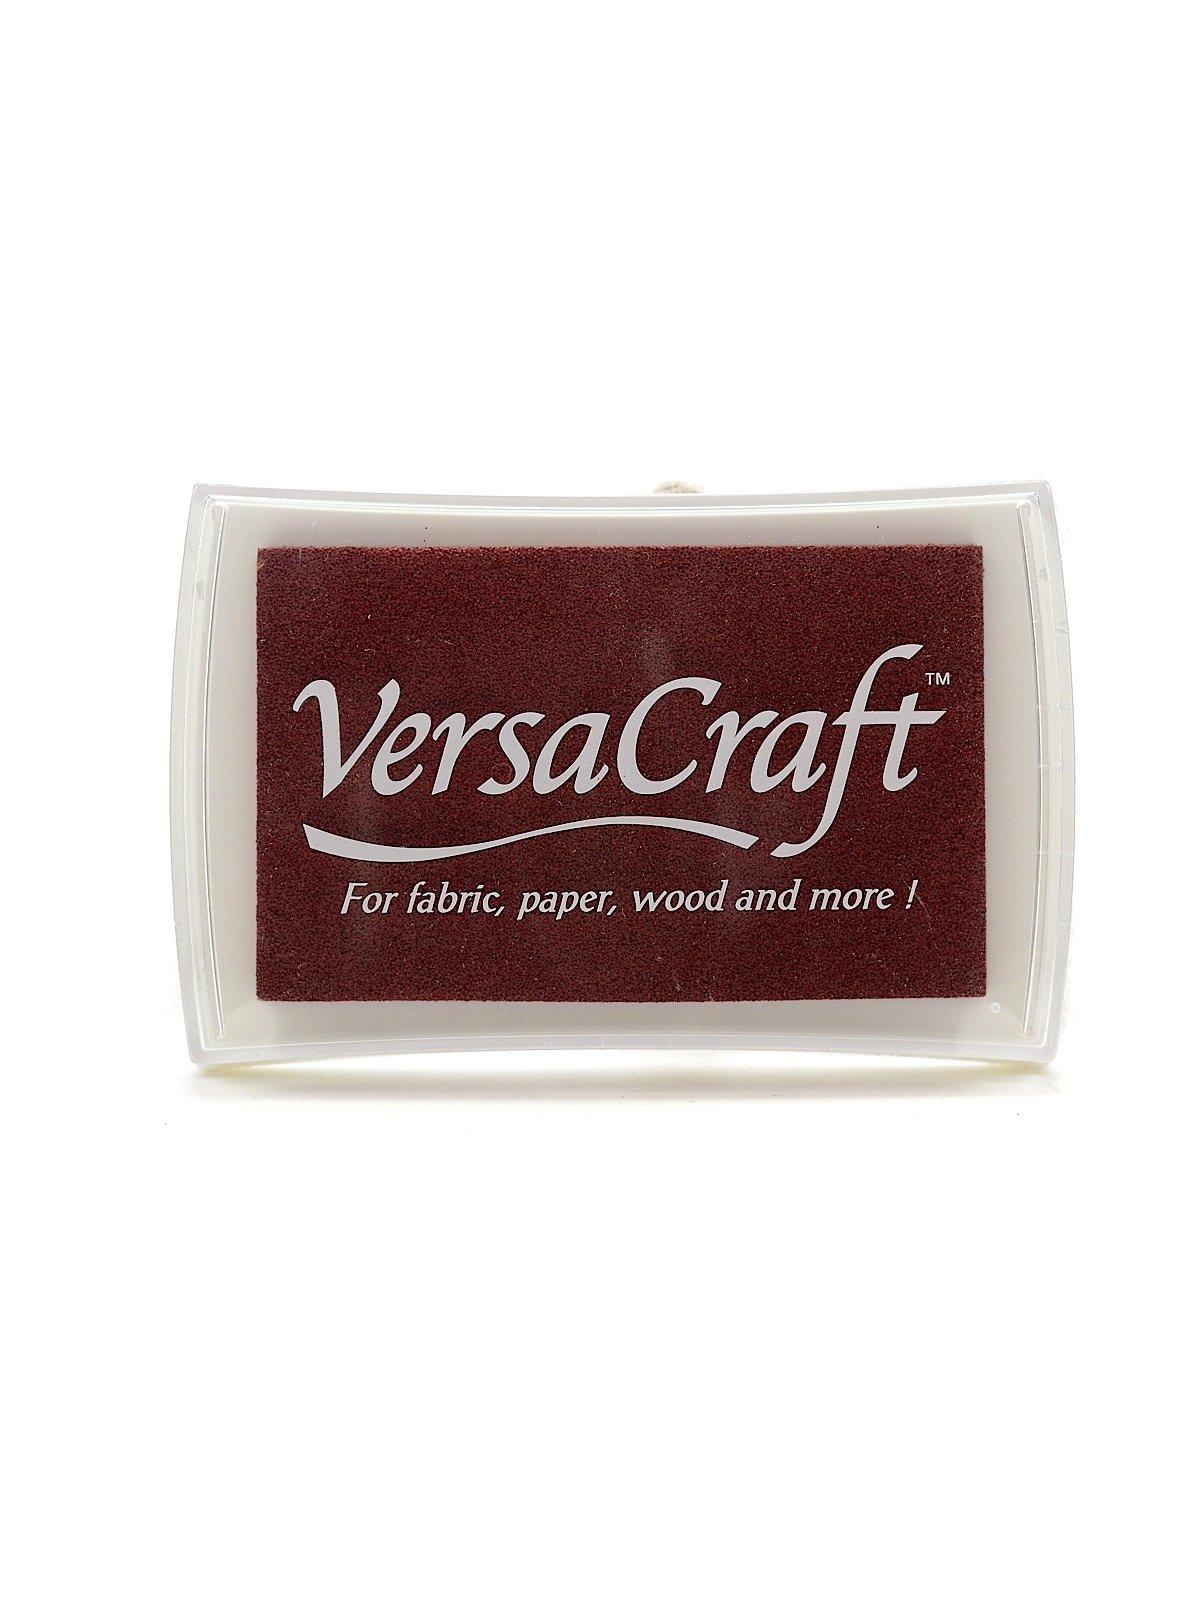 Tsukineko VersaCraft Ink chocolate 3.75 in. x 2.5 in. pad [PACK OF 2 ]